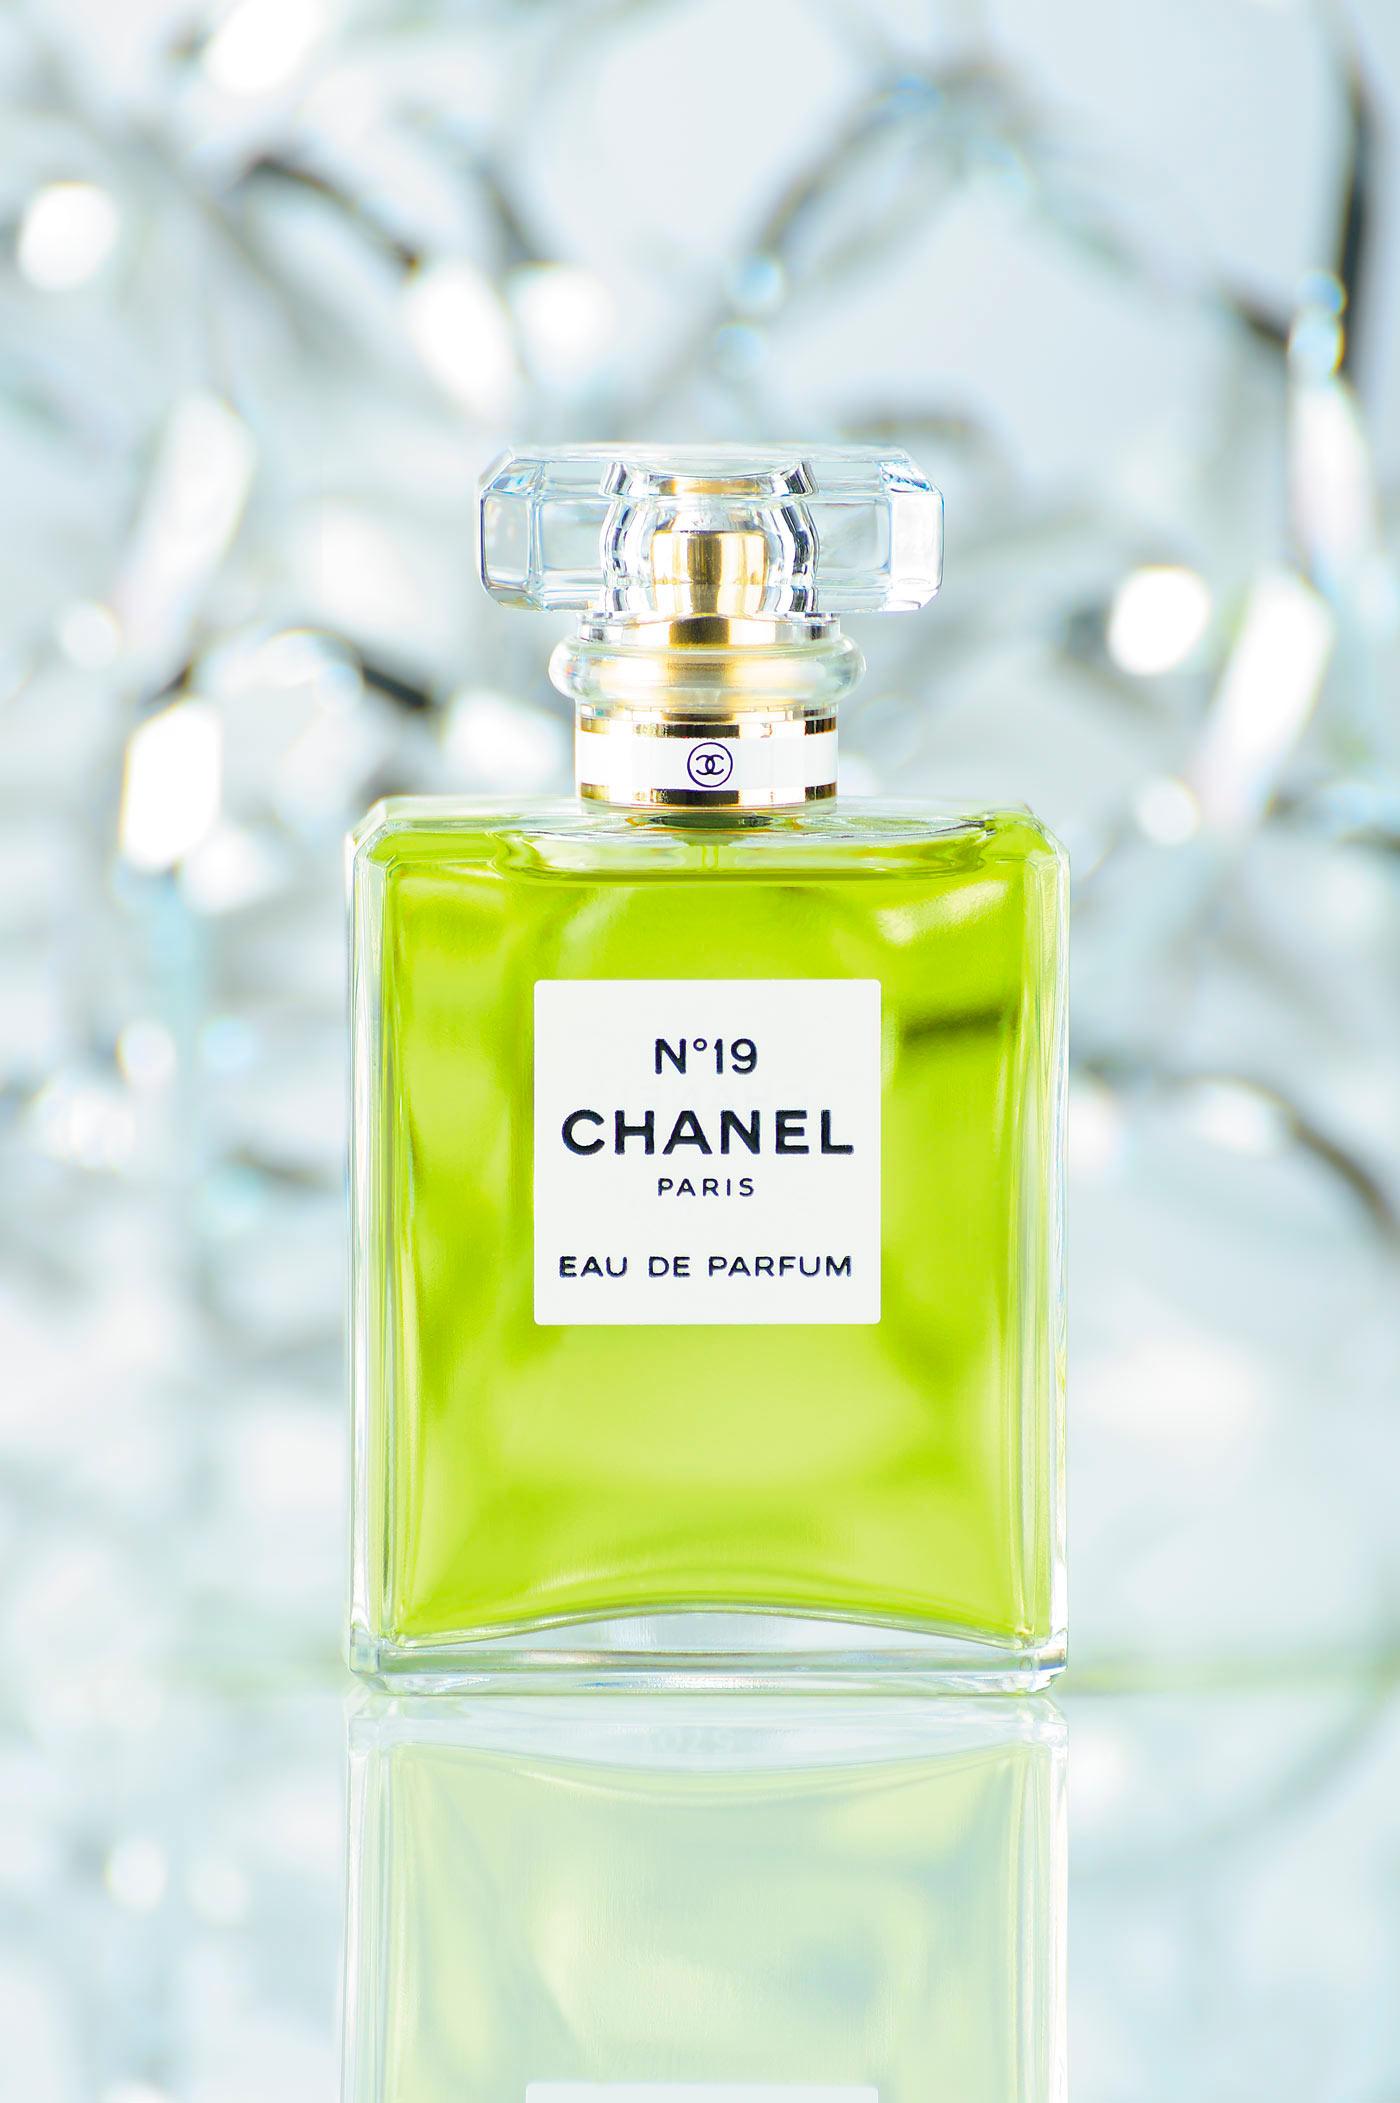 06) studio-product-perfume-phil-rowley-photography-01.jpg